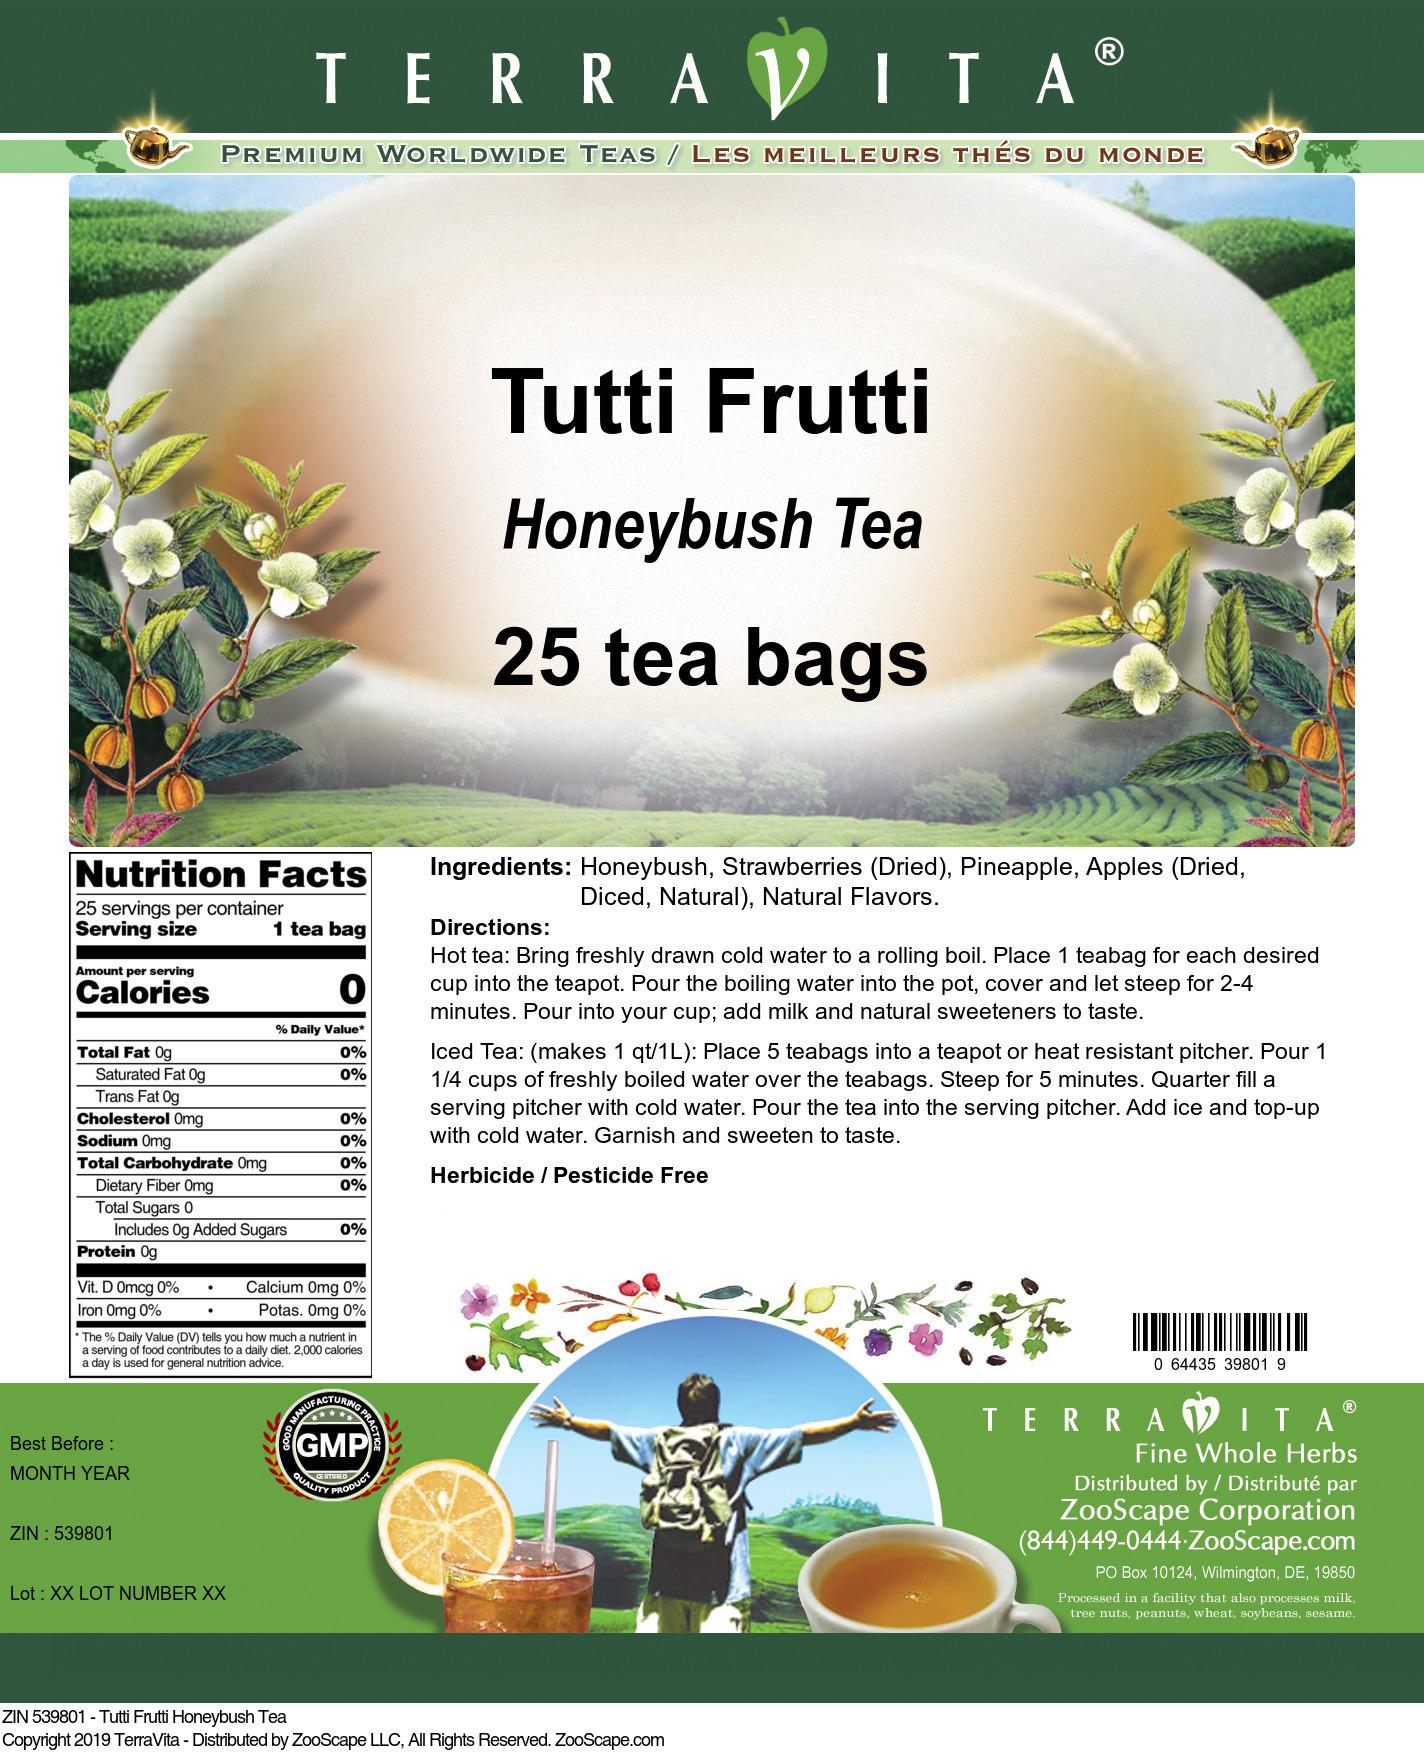 Tutti Frutti Honeybush Tea